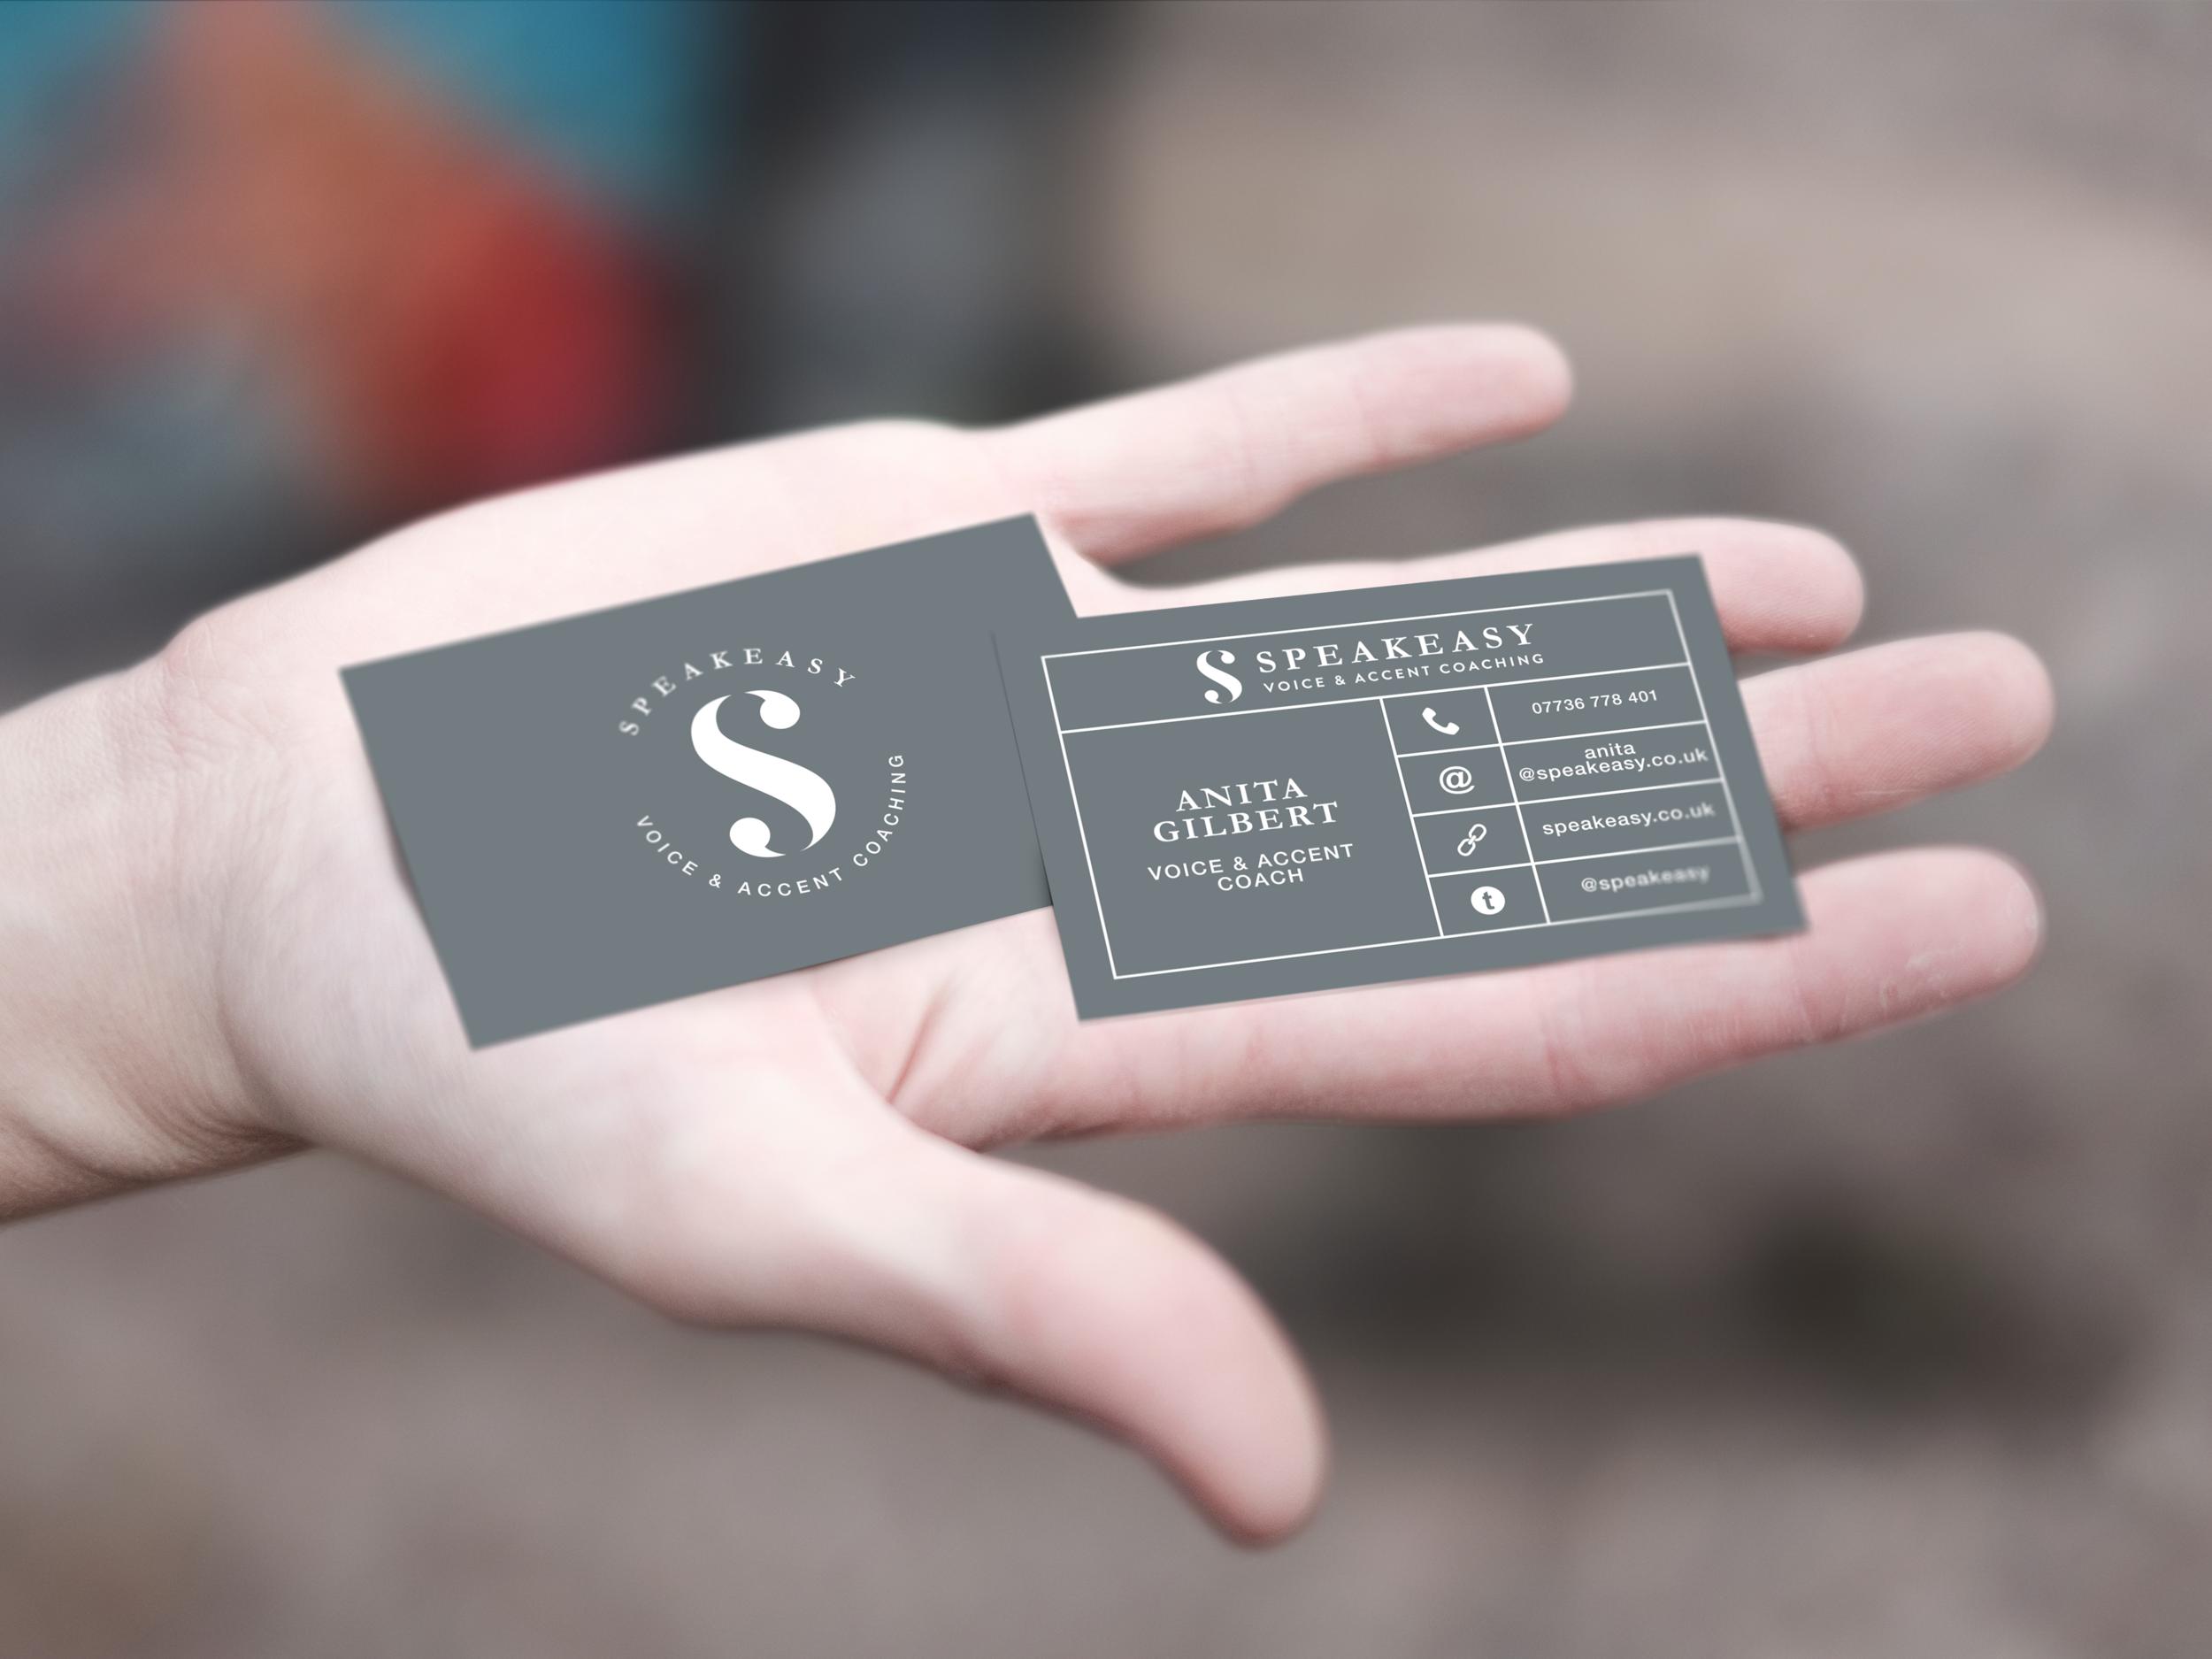 speakeasy-portfolio-businesscards-branding-nifty-fox-creative-sheffield